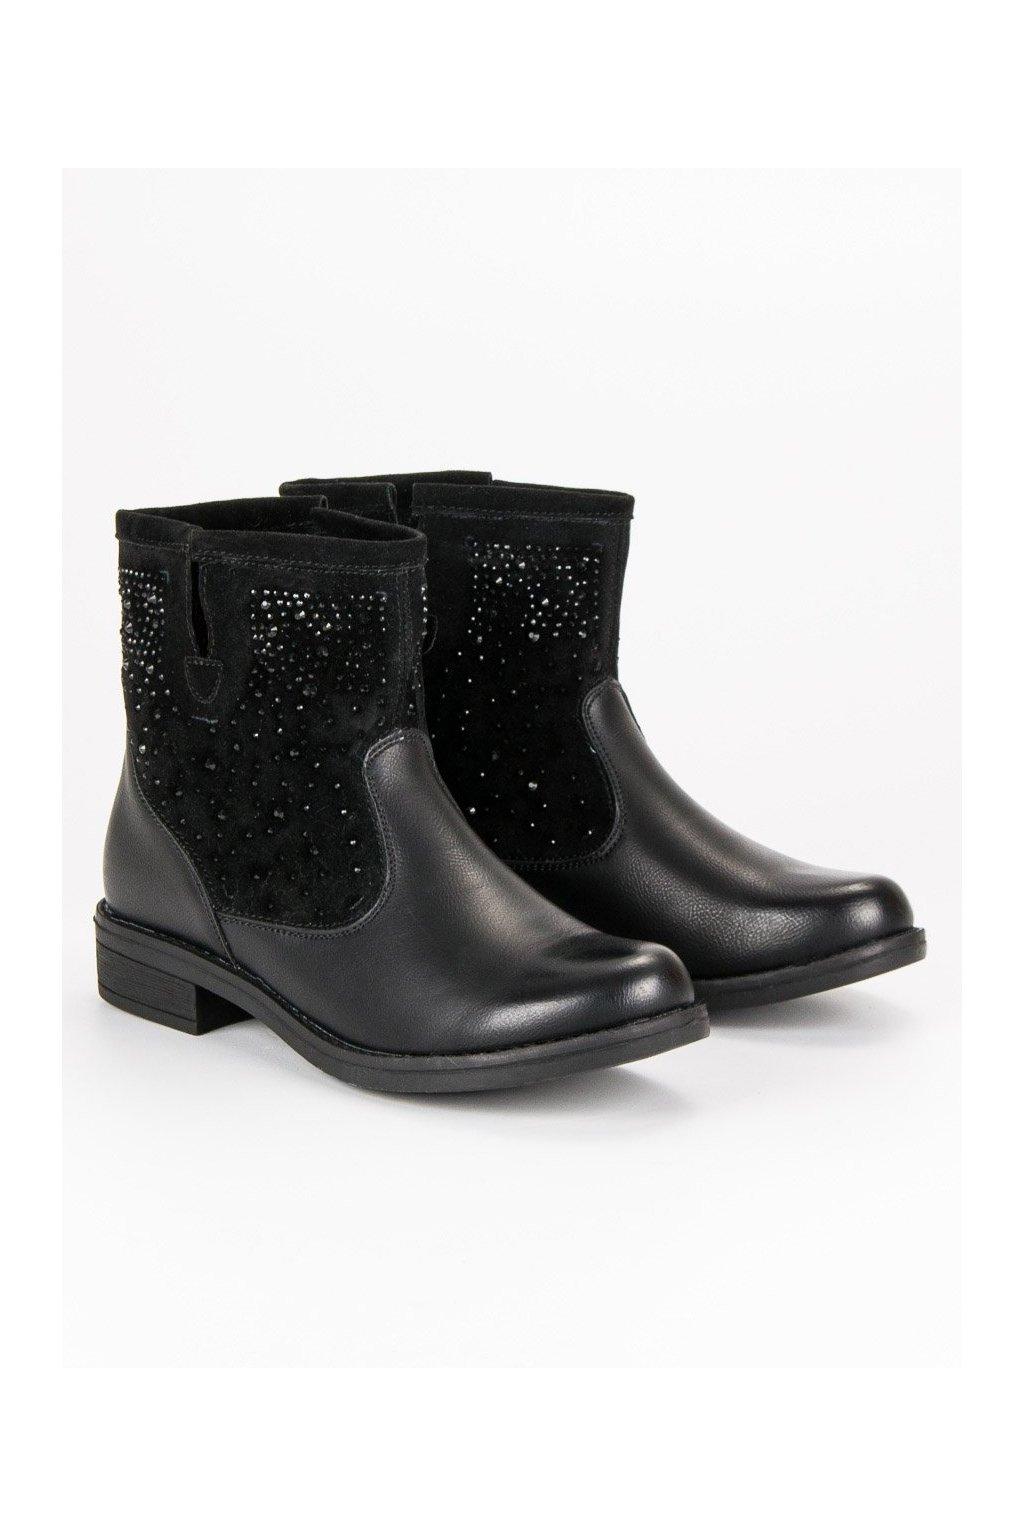 Čierne jesenné topánky vsuvky  e1bb340bcf7